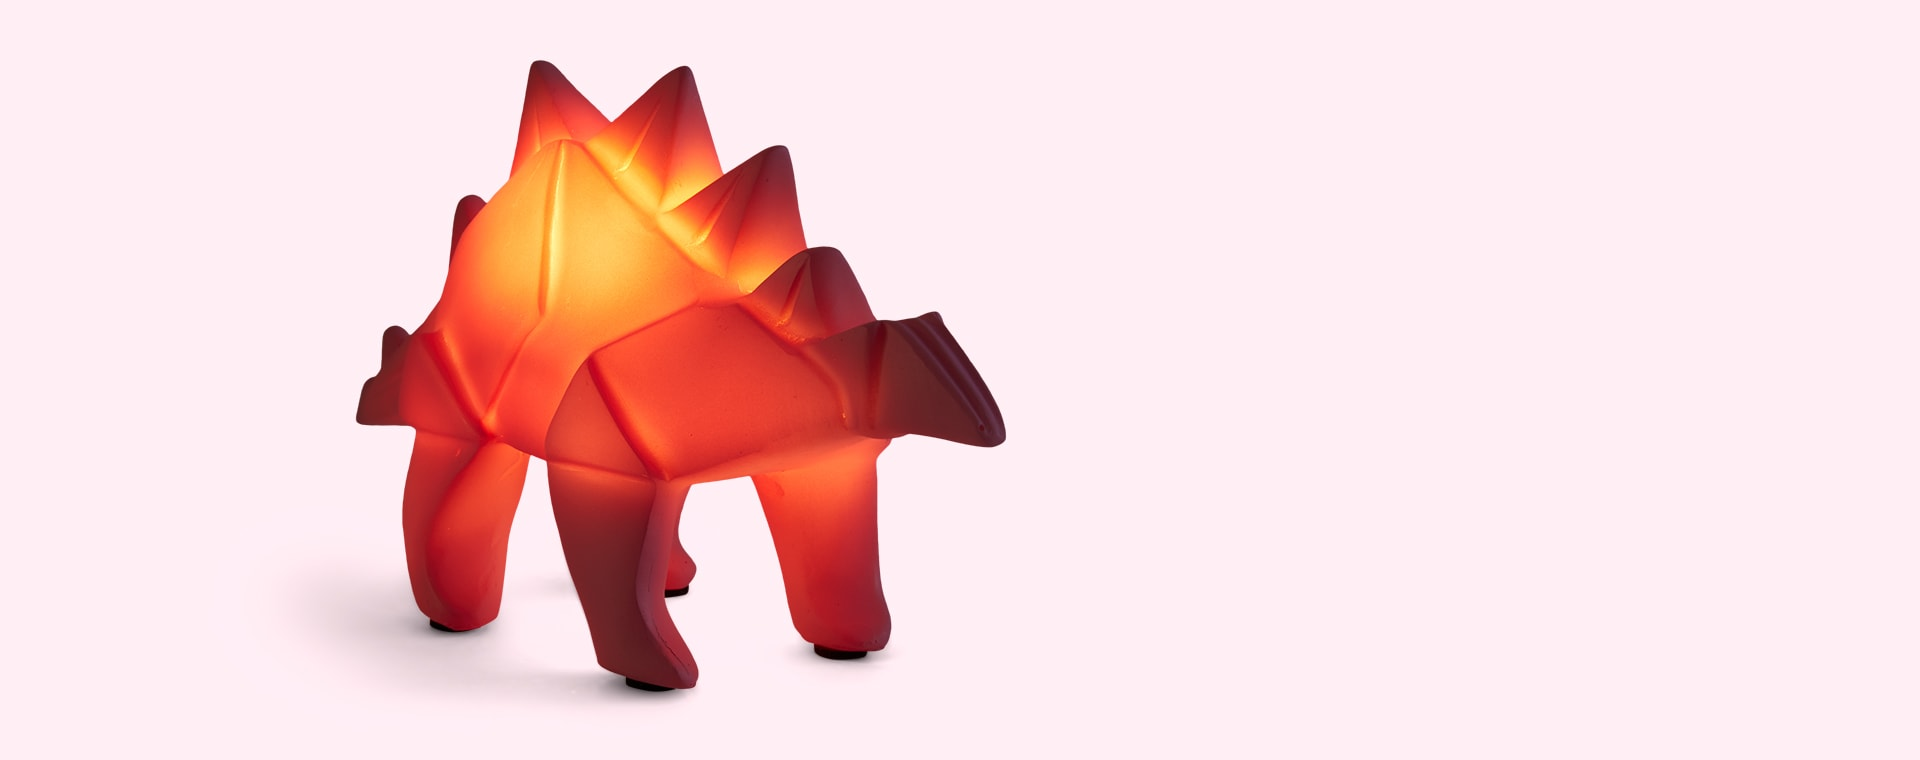 Stegosaurus House of Disaster Origami Dinosaur LED Lamp